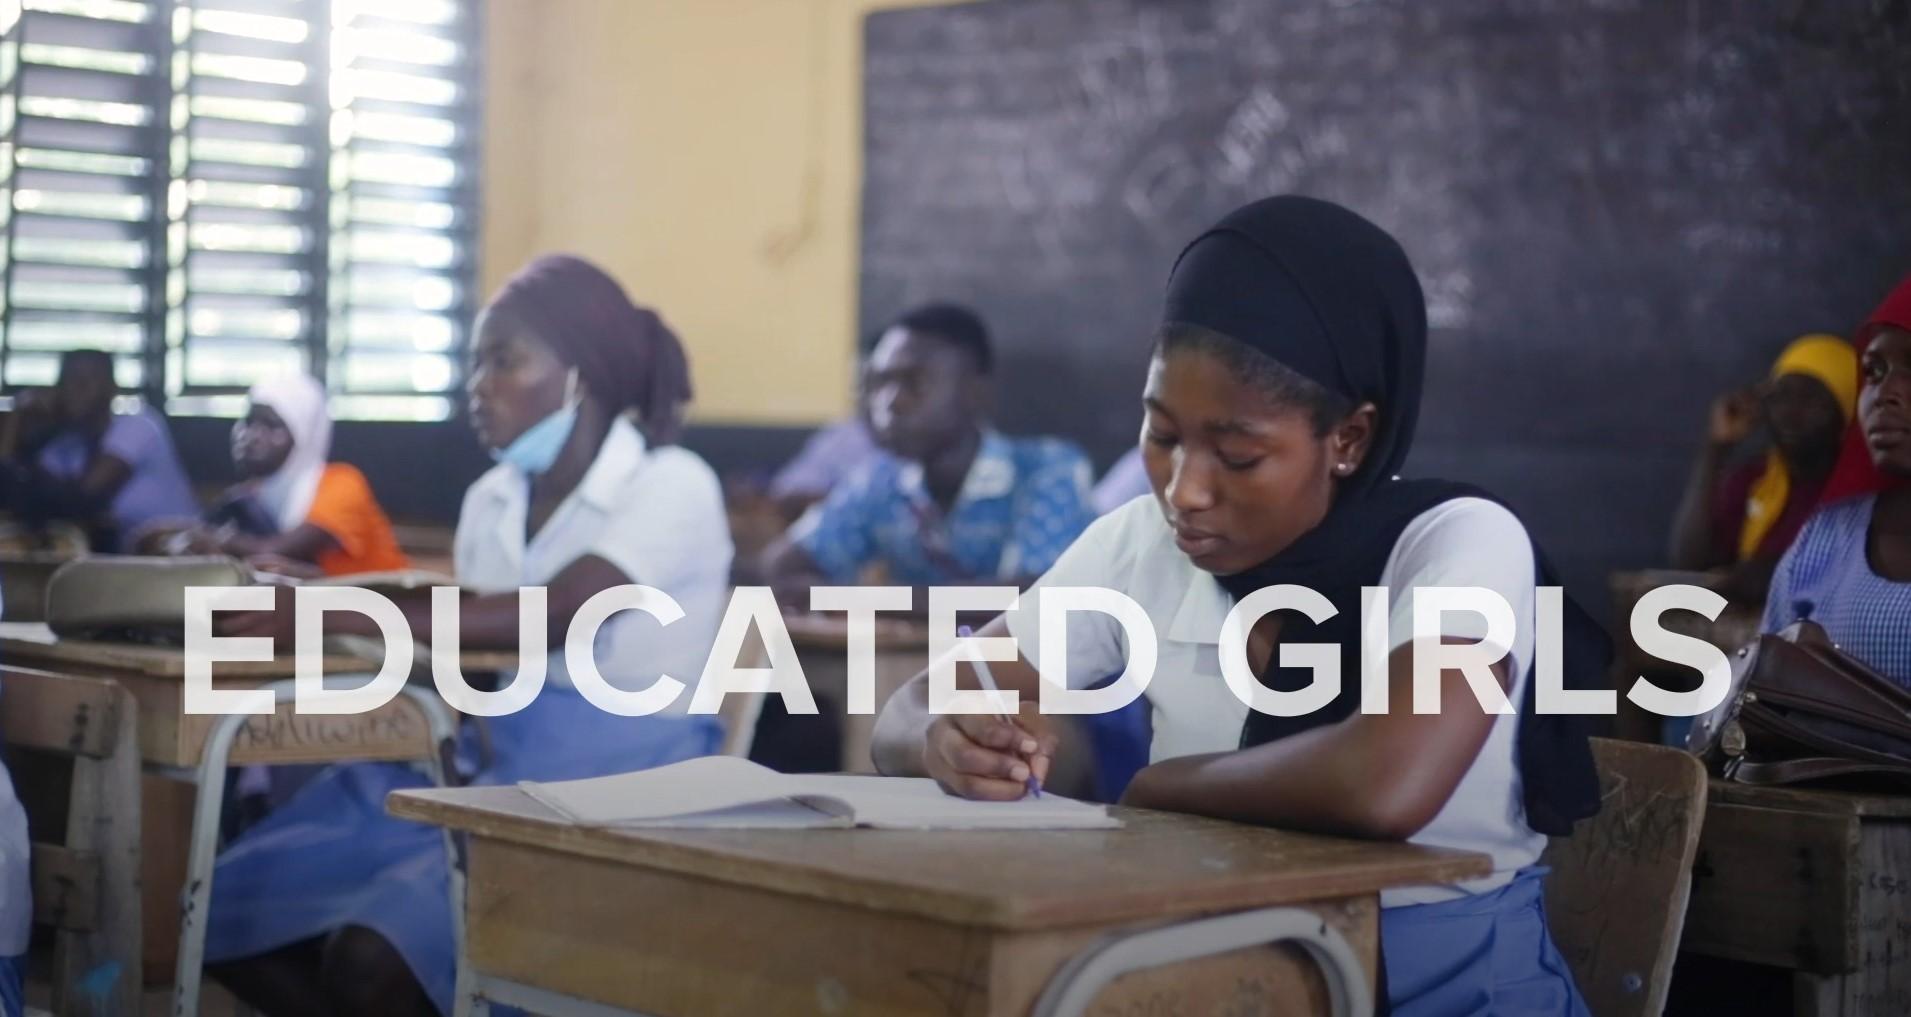 Educated Girls